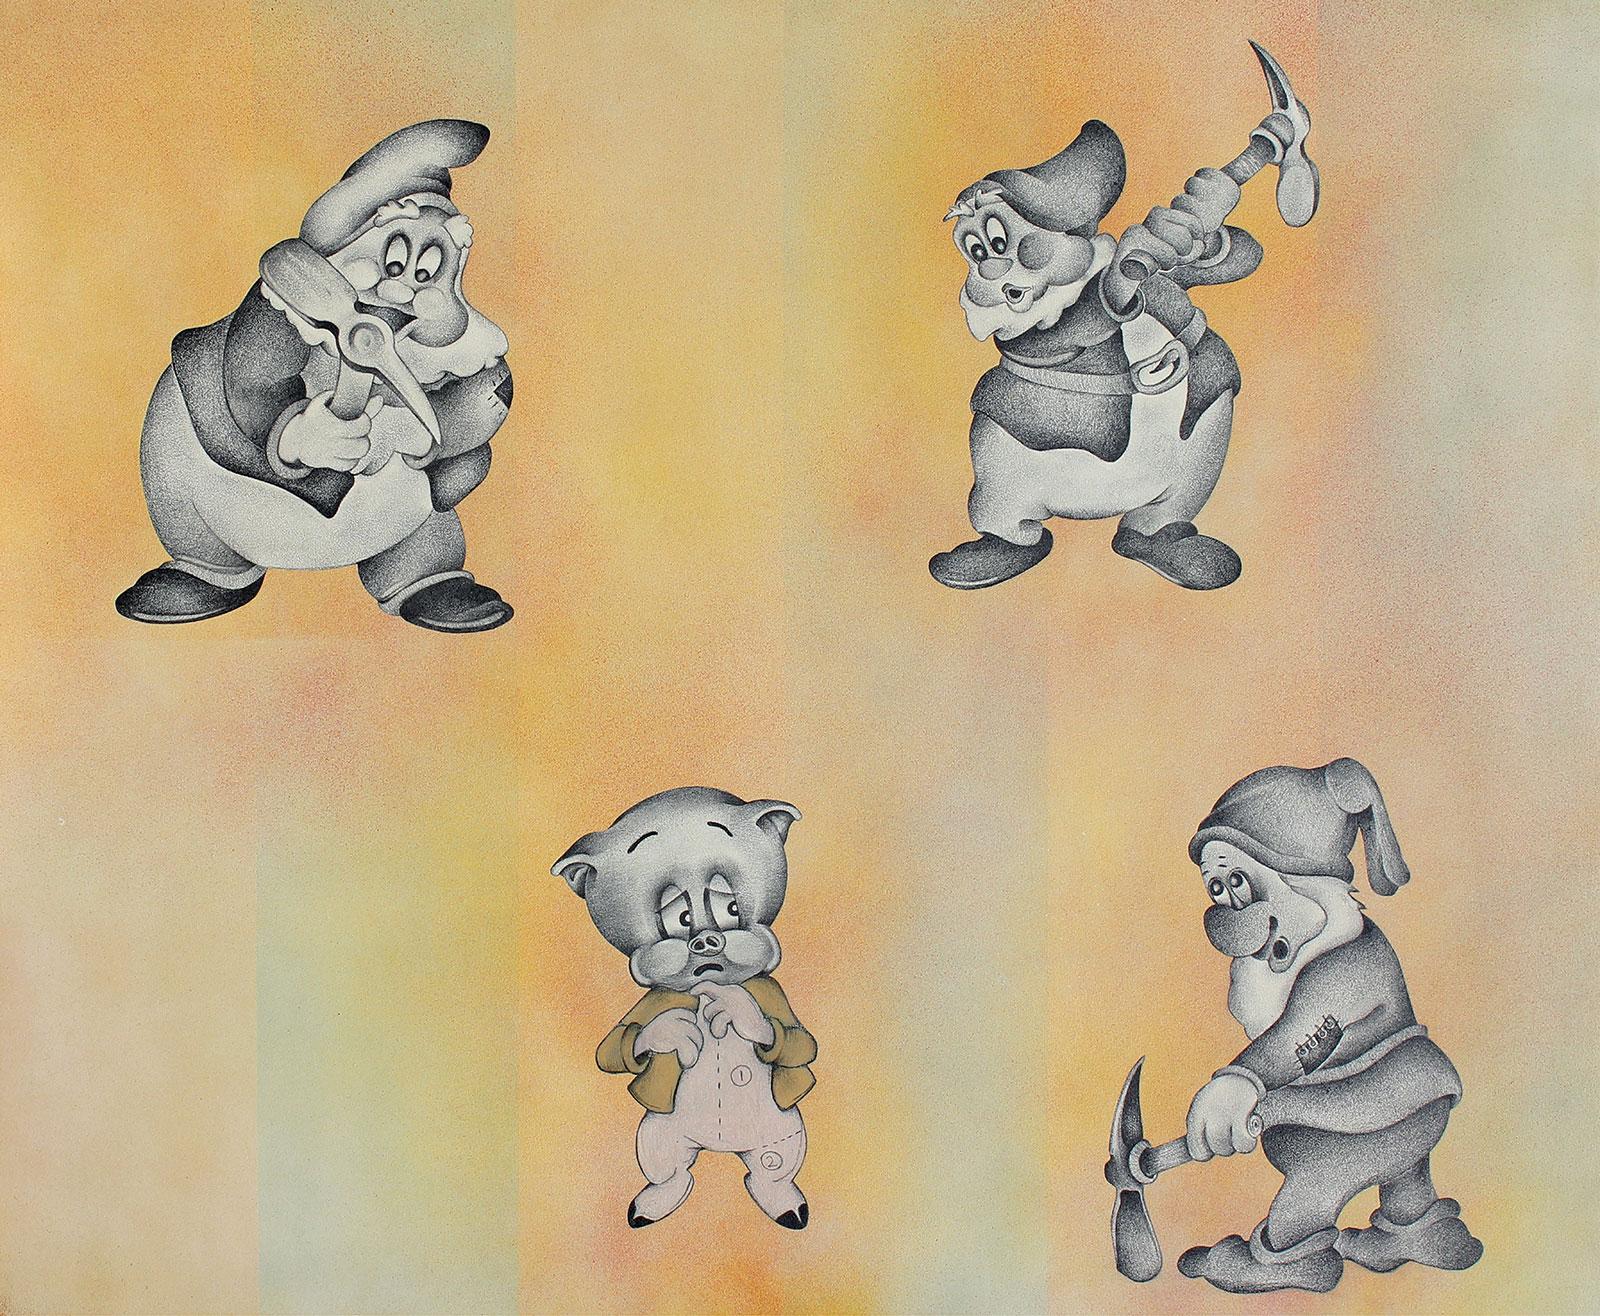 cartoon Disney dwarves threatening pig